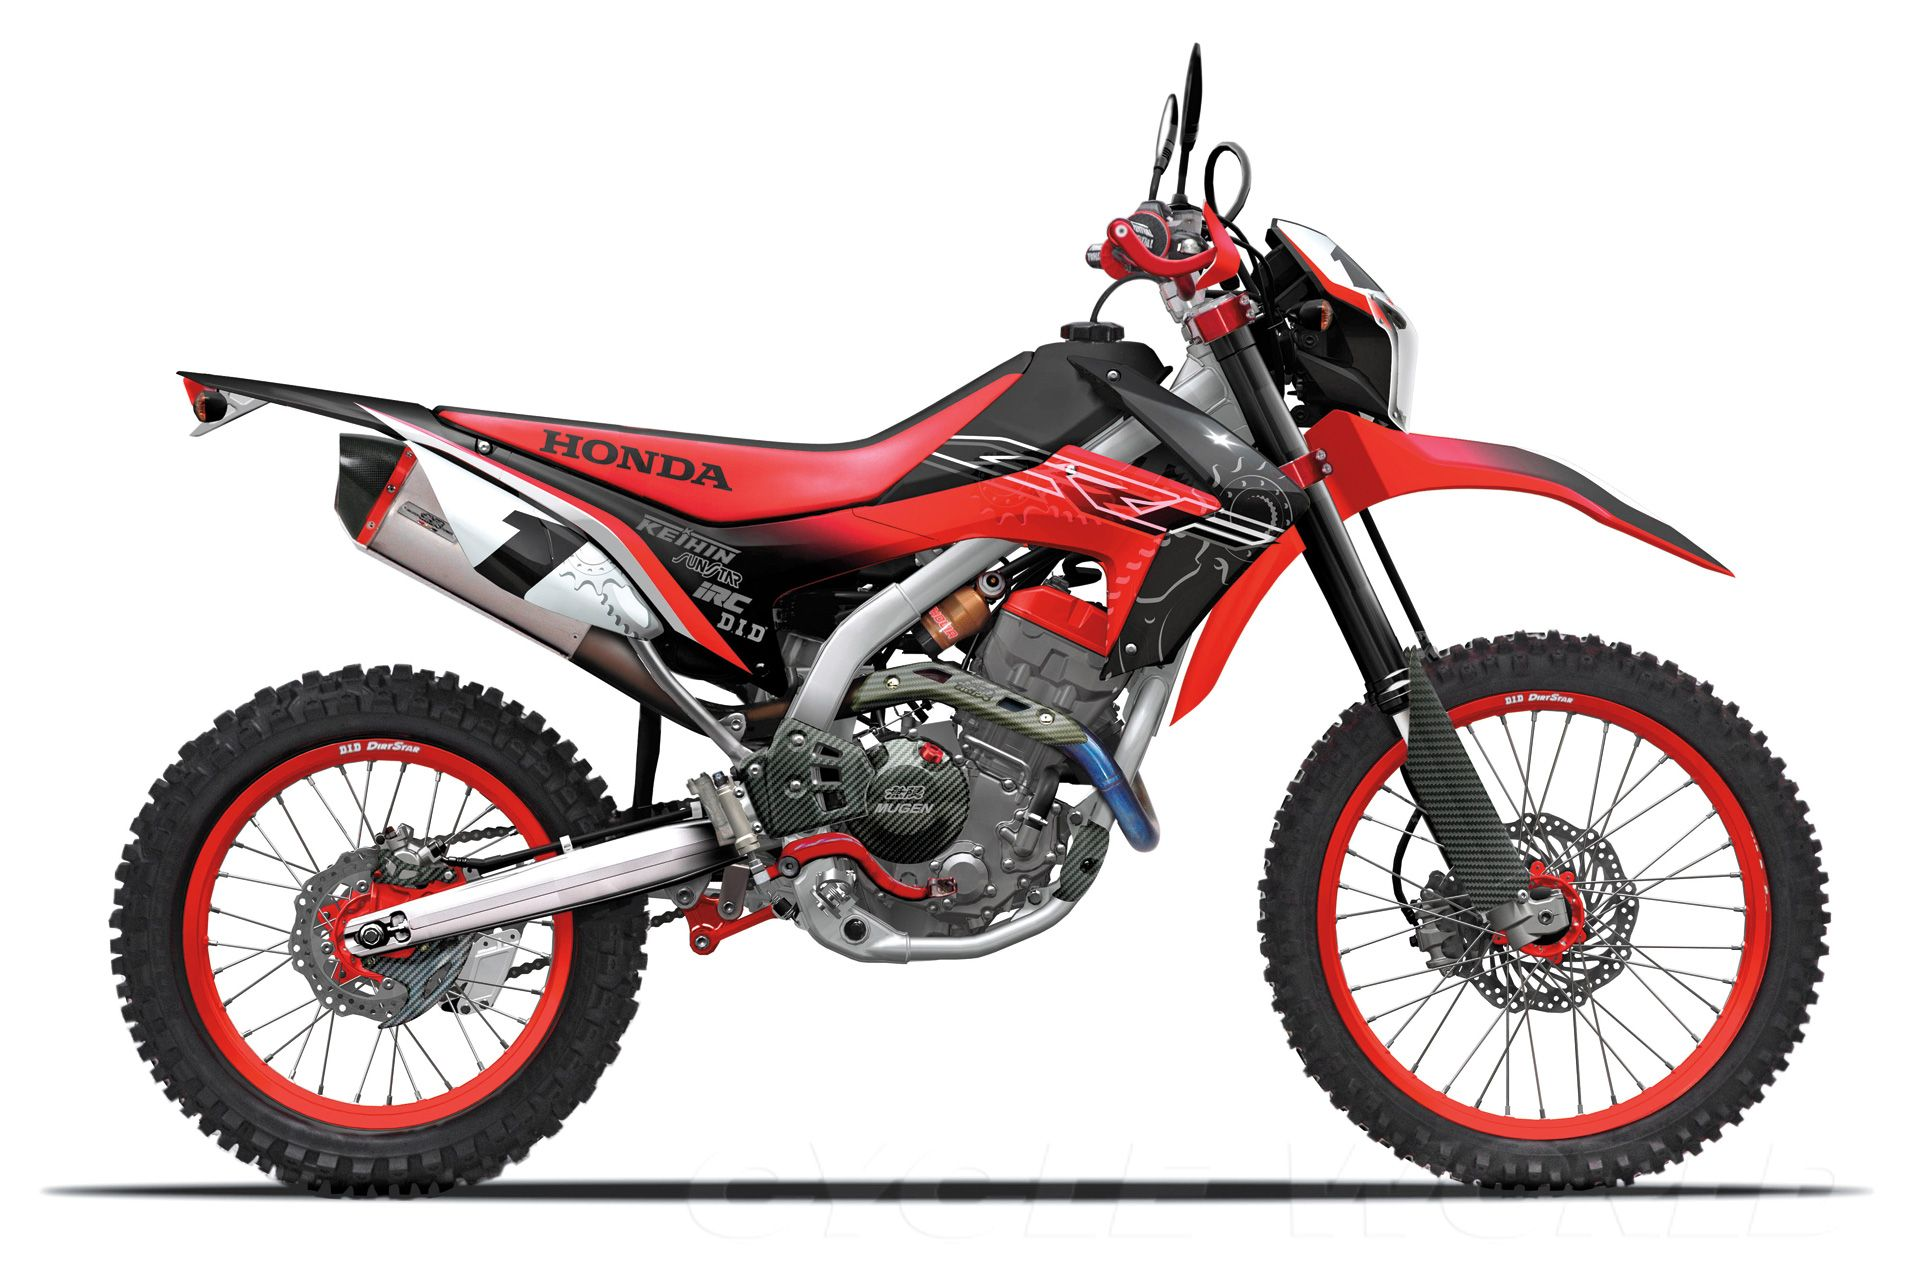 Honda CRF250L Dual sport motorcycle, Enduro motorcycle